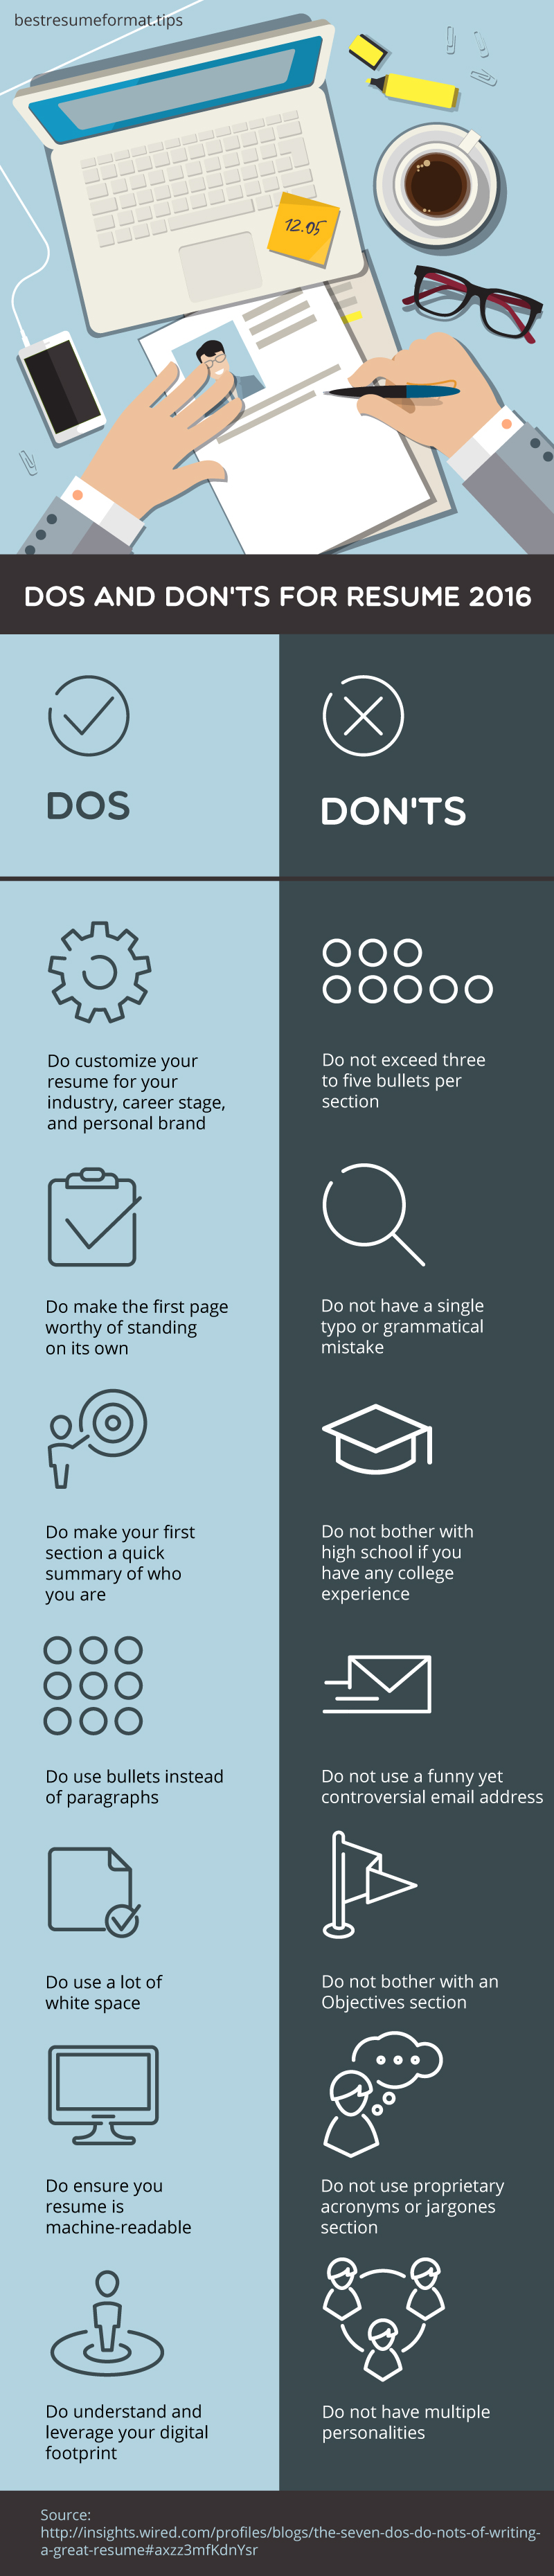 Best Resume Format 2016 explains the best ways to make